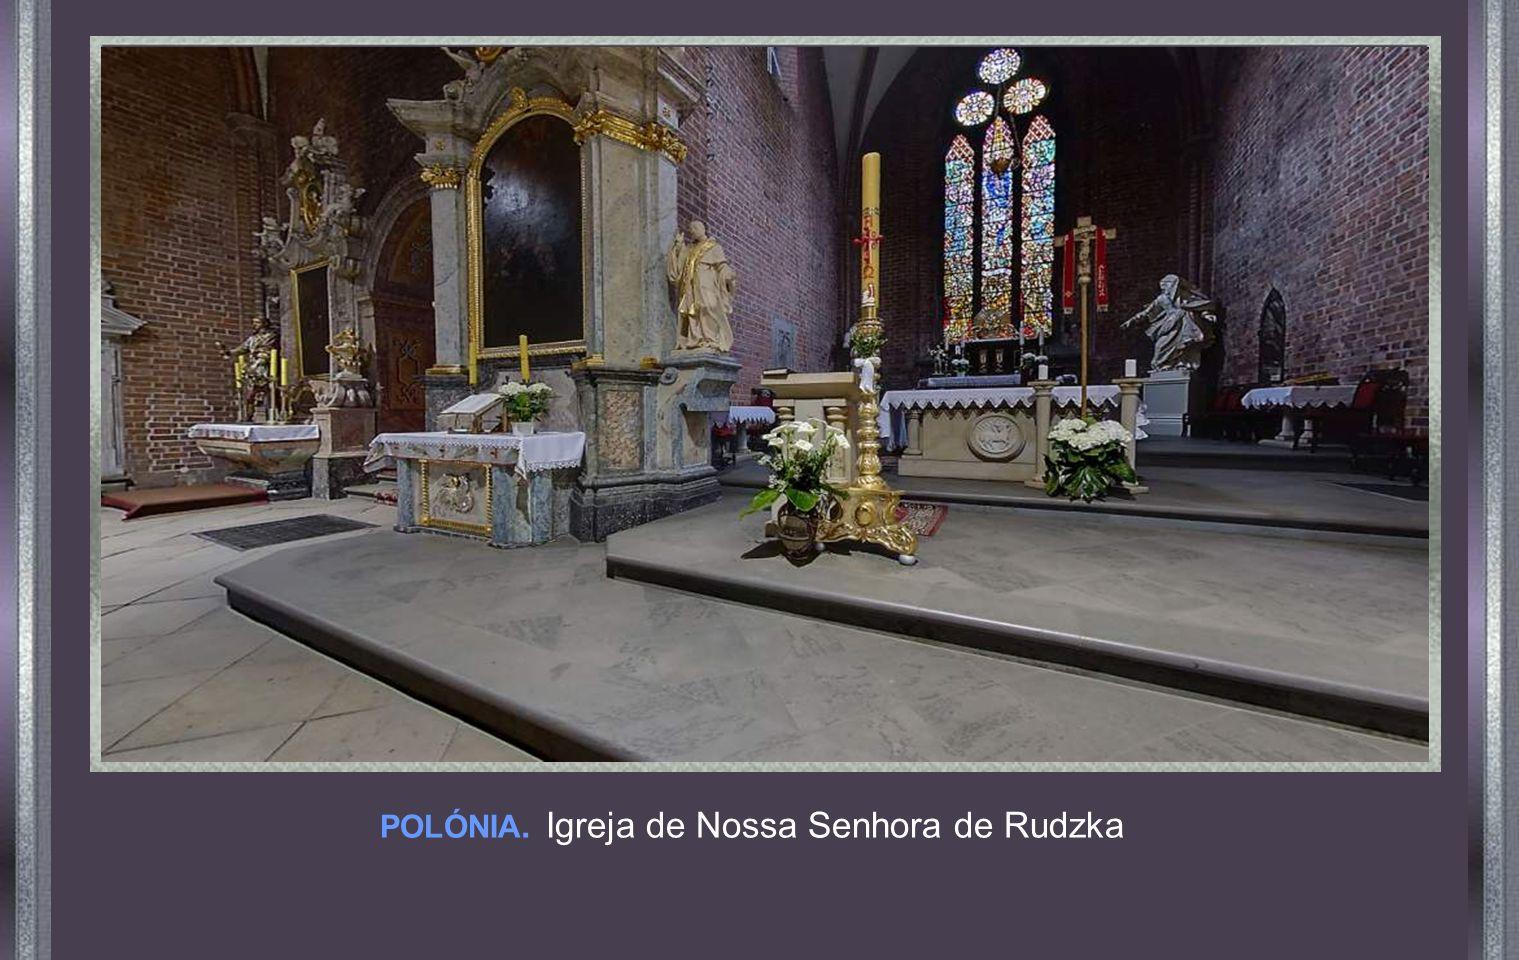 POLÓNIA. Igreja de Nossa Senhora de Rudzka